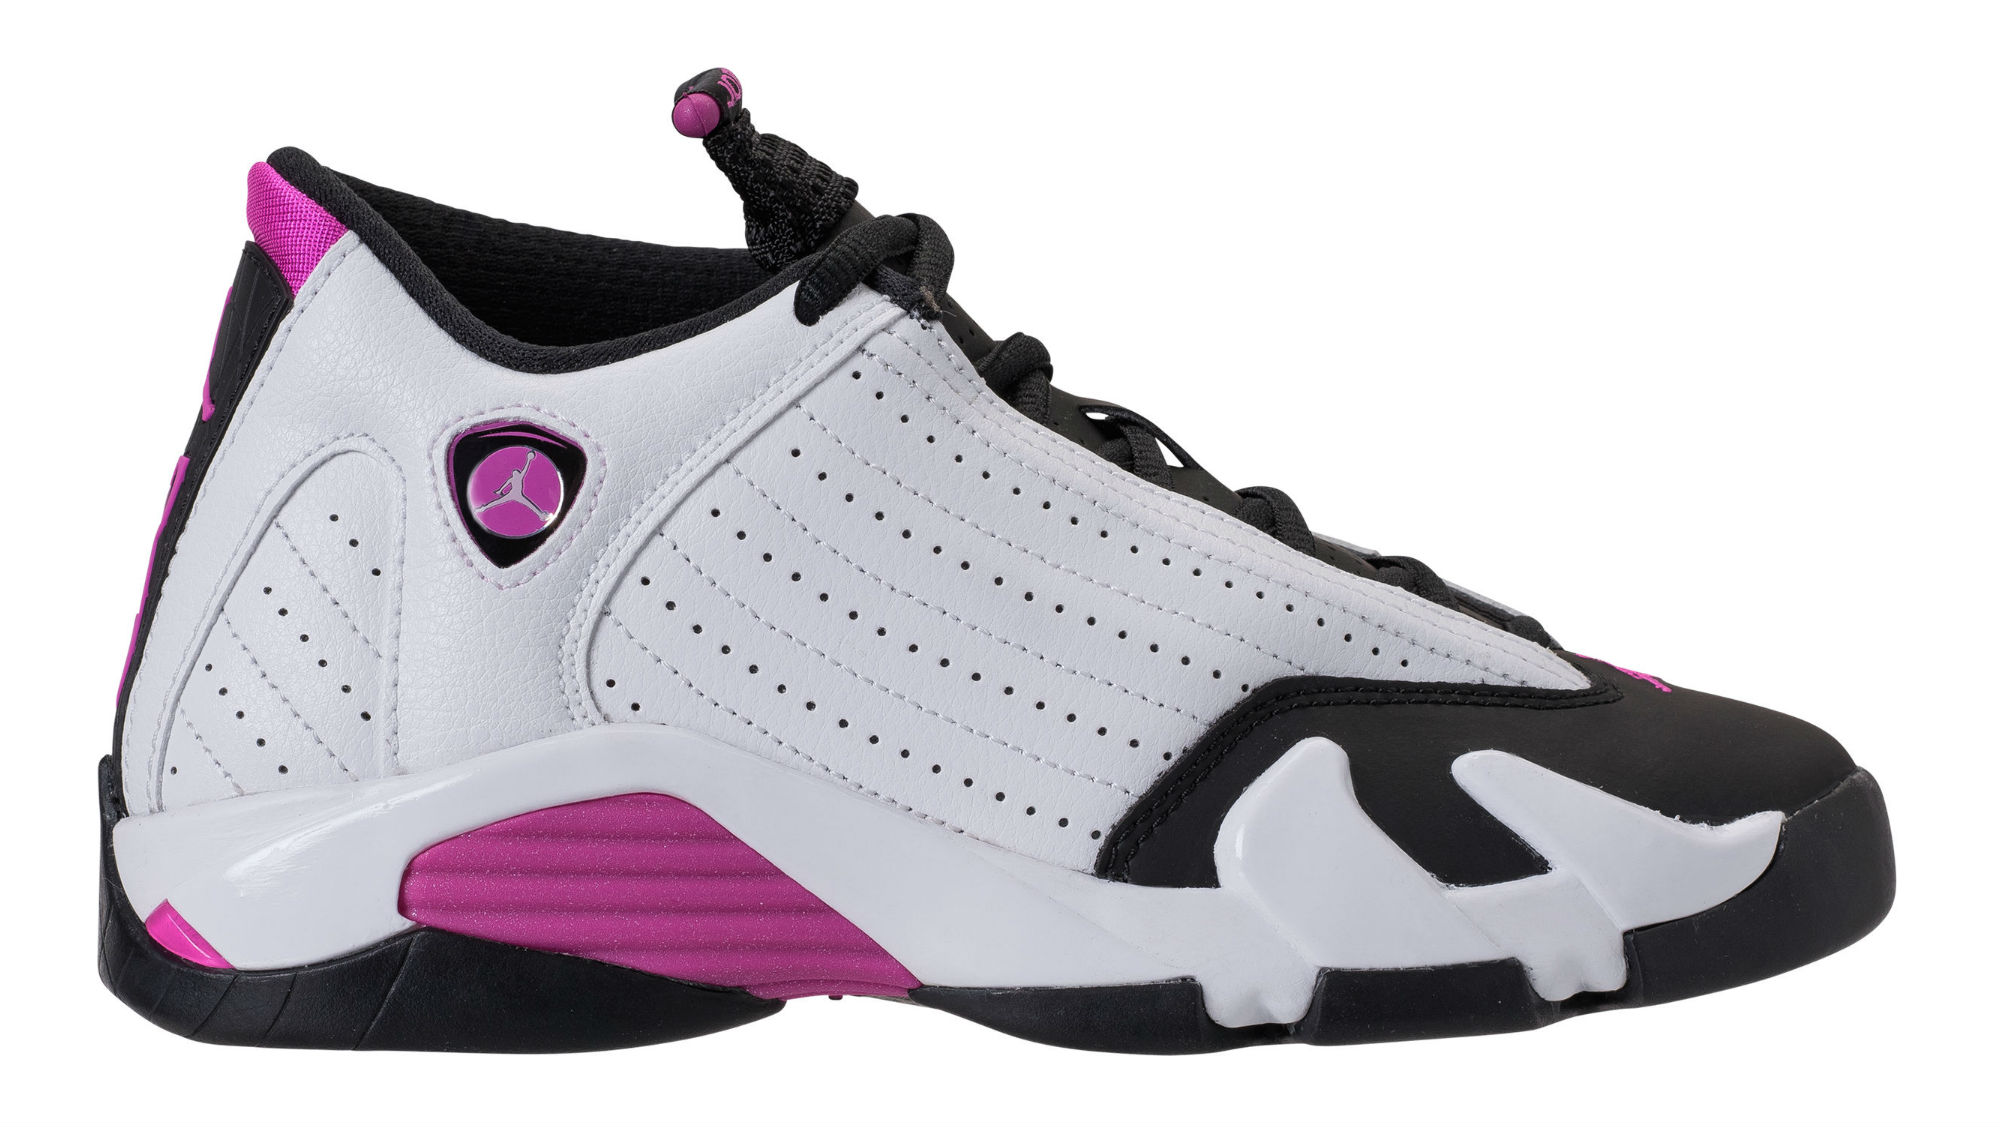 sale retailer e1fc6 2db34 Air Jordan 14 XIV Girls Fuchsia Blast Release Date 654969-119   Sole  Collector